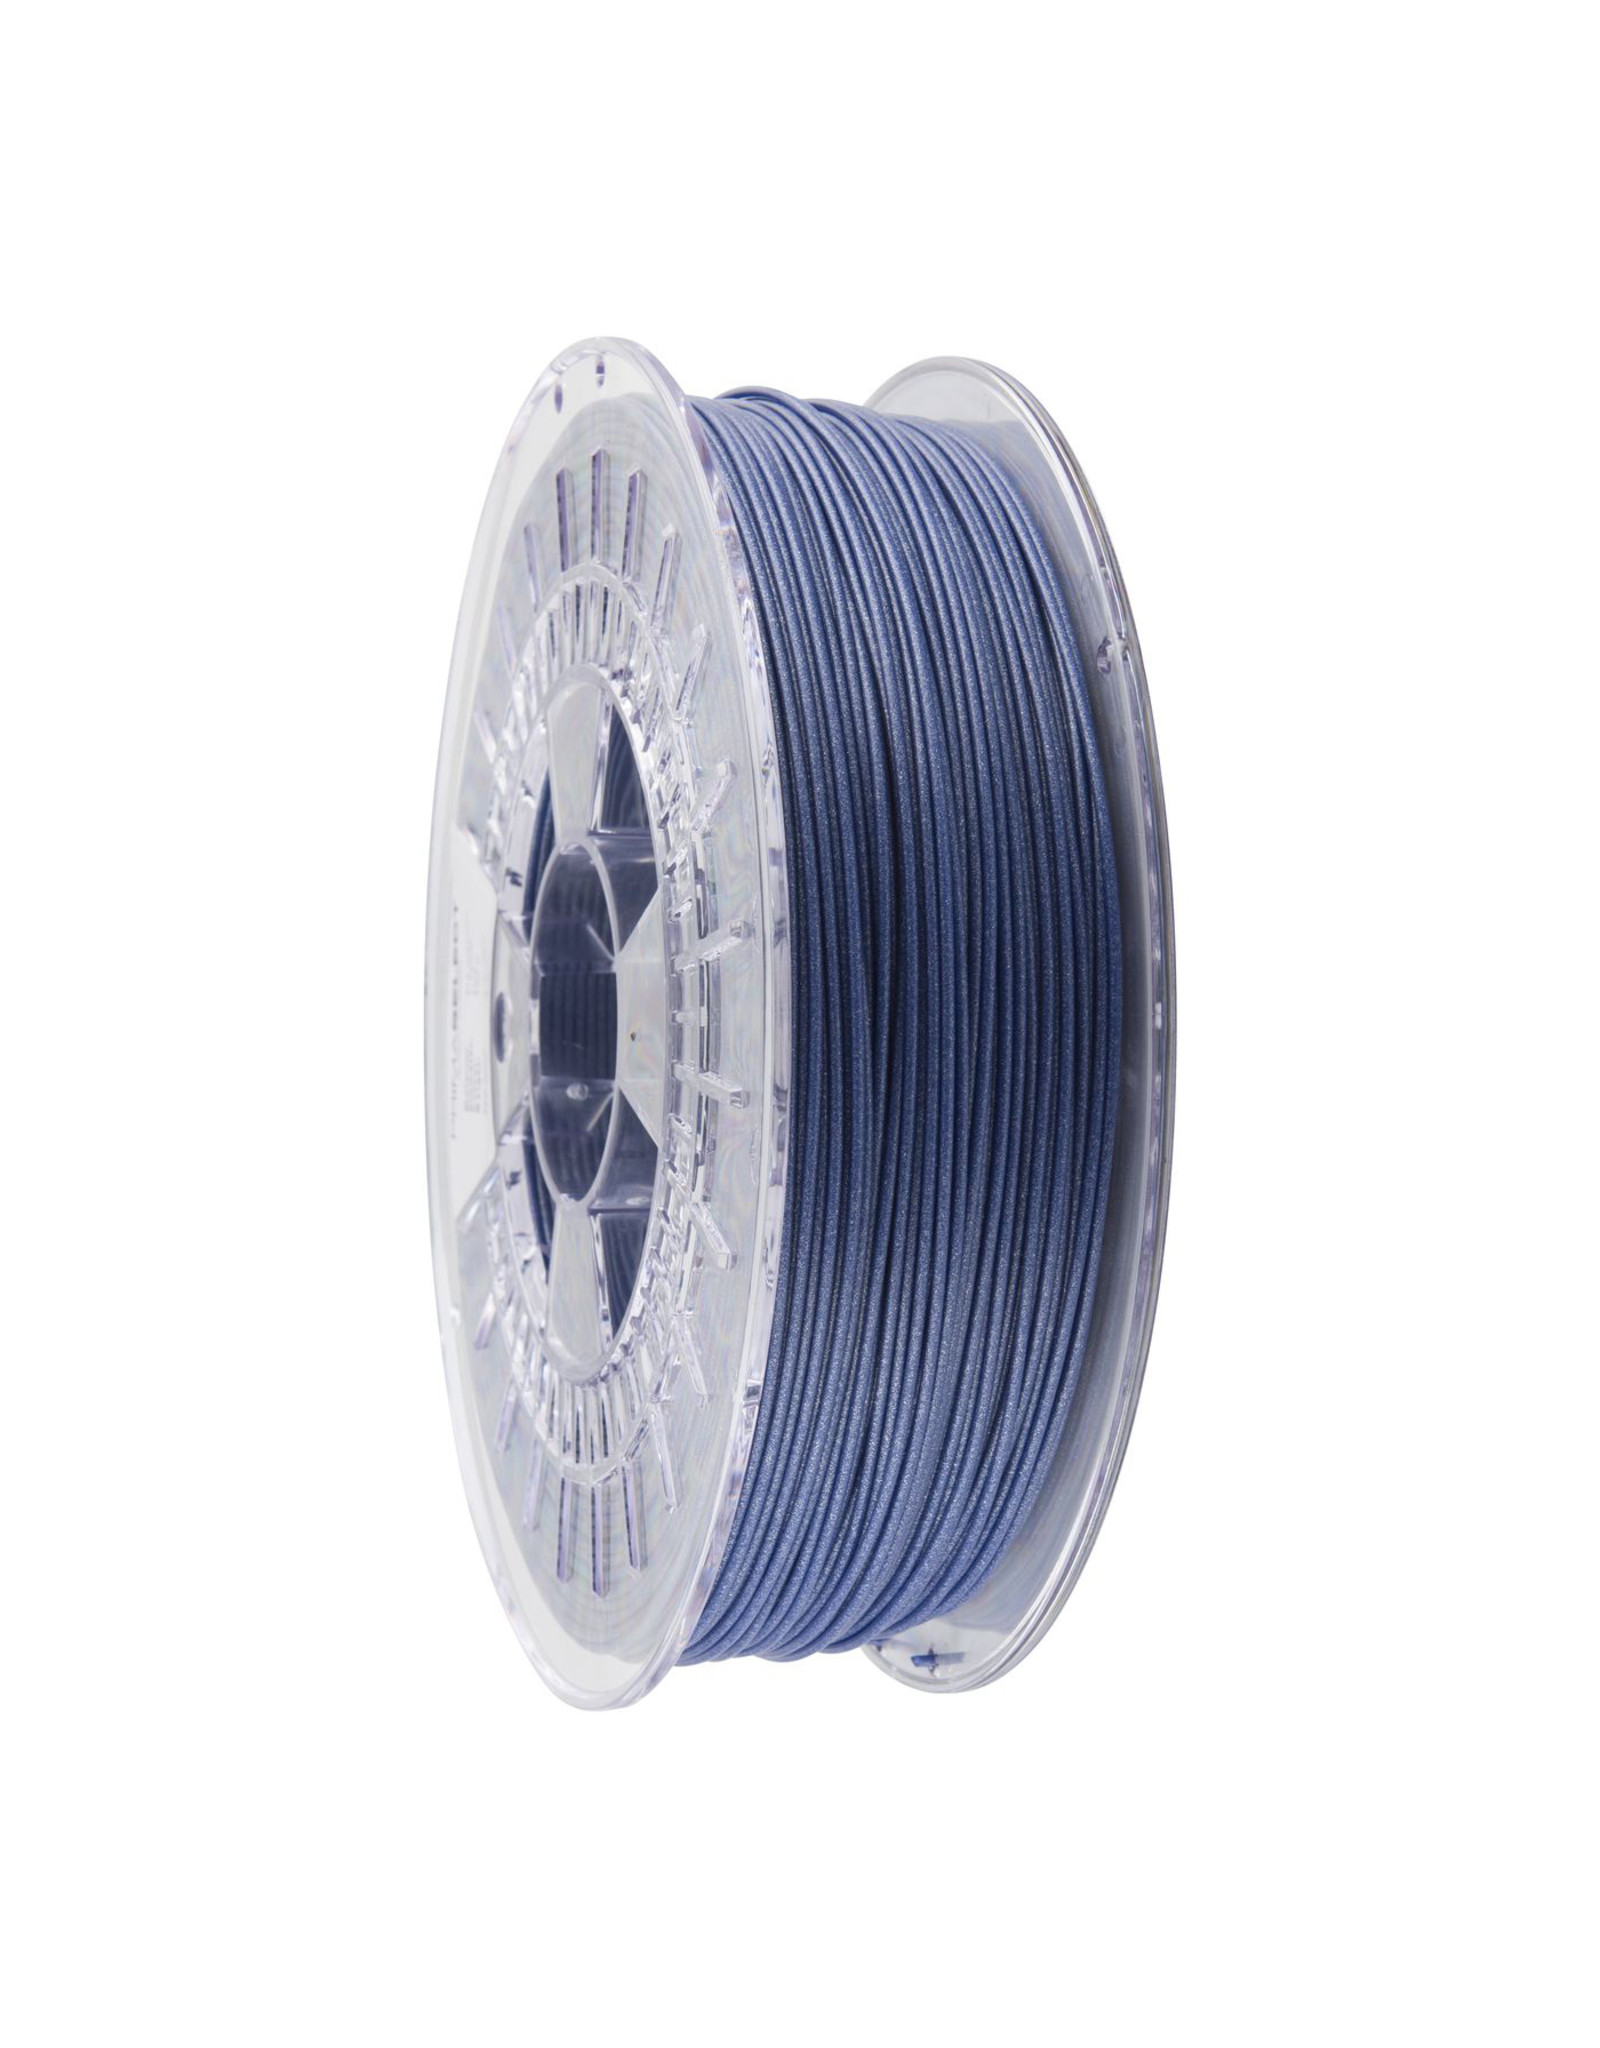 Prima PrimaSelect PLA 1.75mm - 750gr Metallic blauw